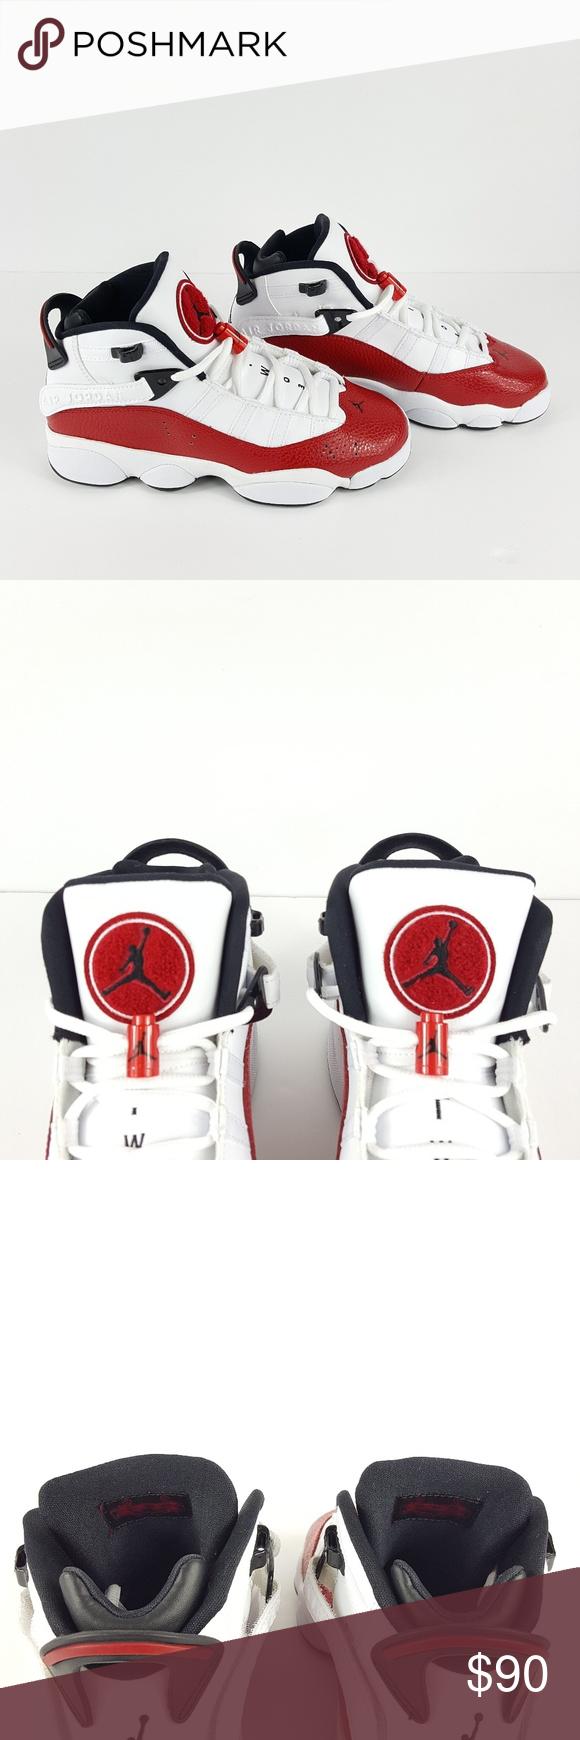 0ac5c0986059b Nike Big Kids Jordan 6 rings GS NEW AUTHENTIC Gym Nike Big Kids ...